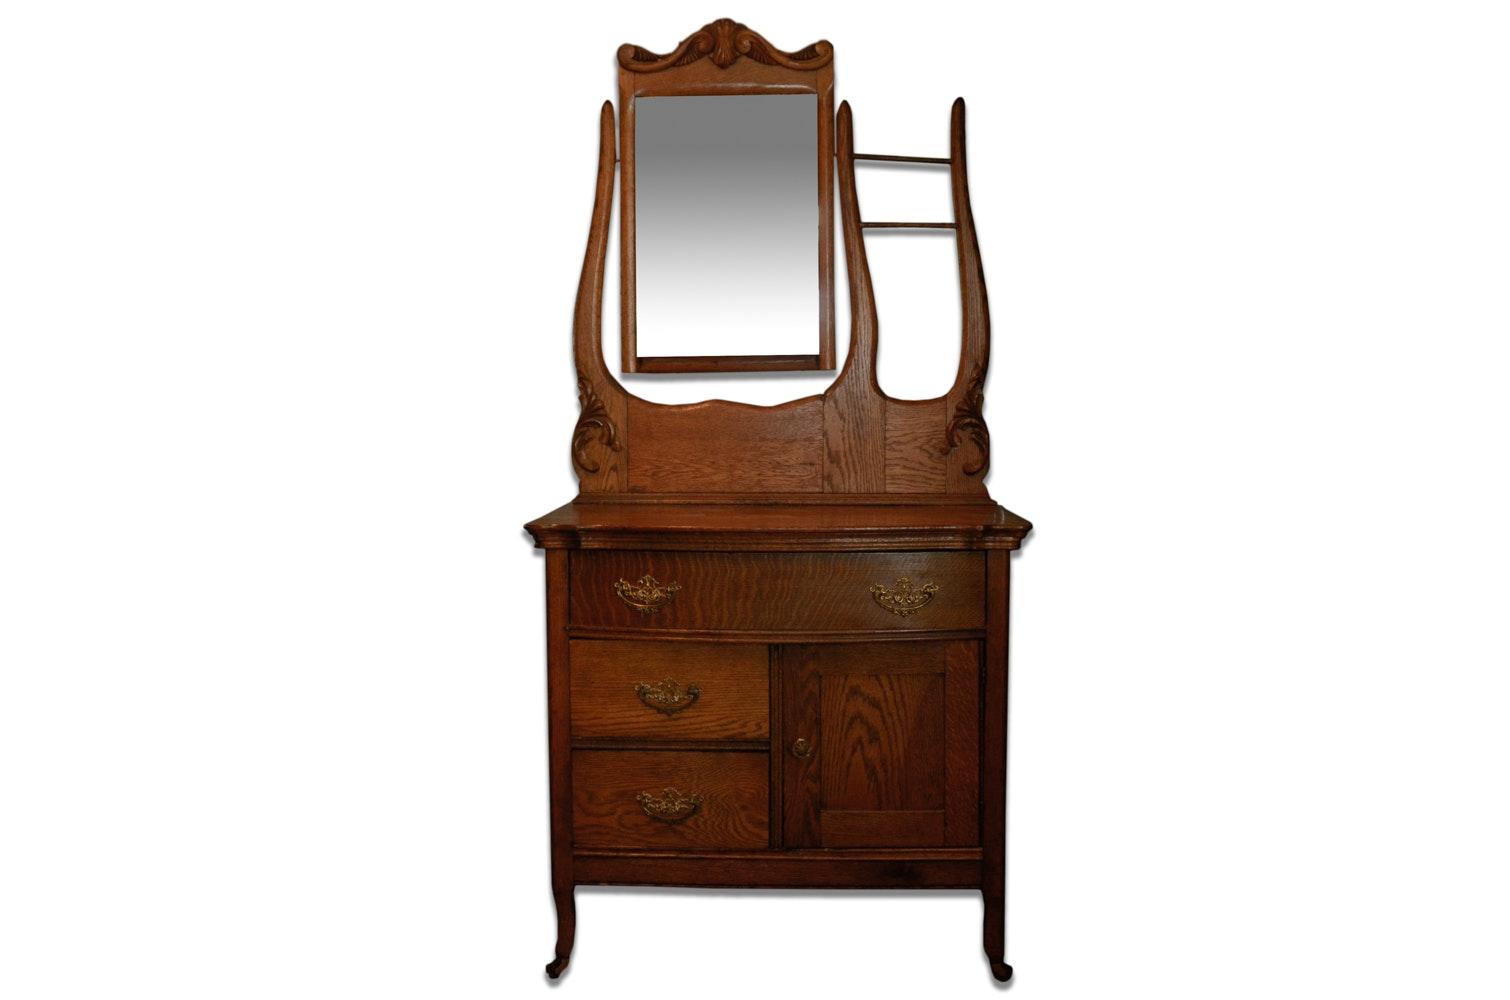 Circa 1900 Washstand With Mirror